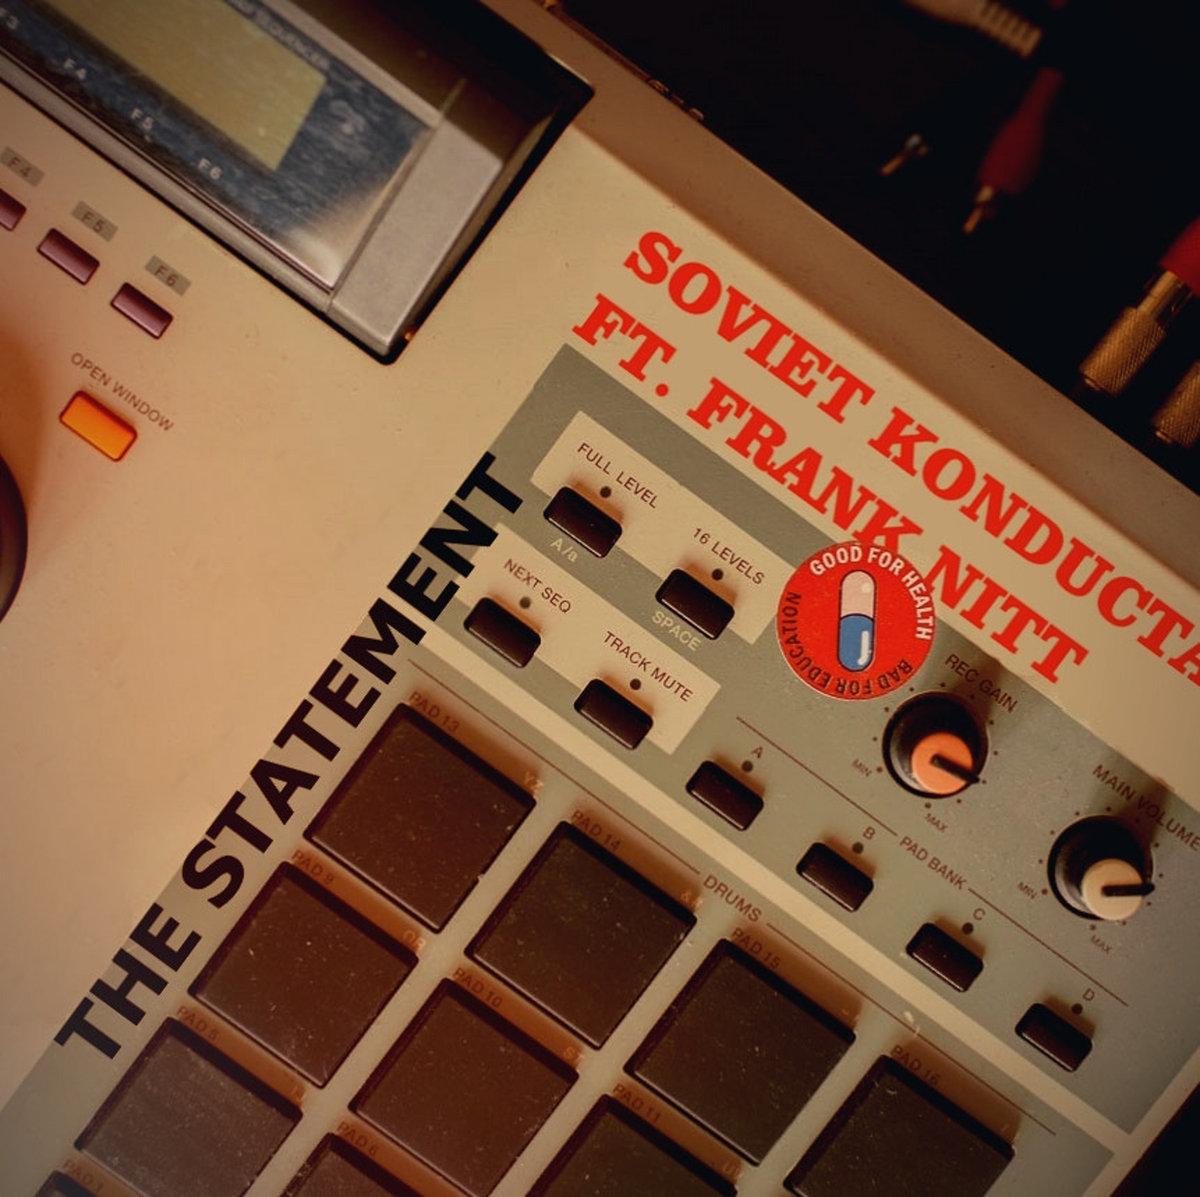 No Words #100: Soviet Konducta ft. Frank Nitt, Bobby Obsy, DJ Halabi, Graf Cratedigger, DJ Buzz & Mono:Massive, Jonny Tobin